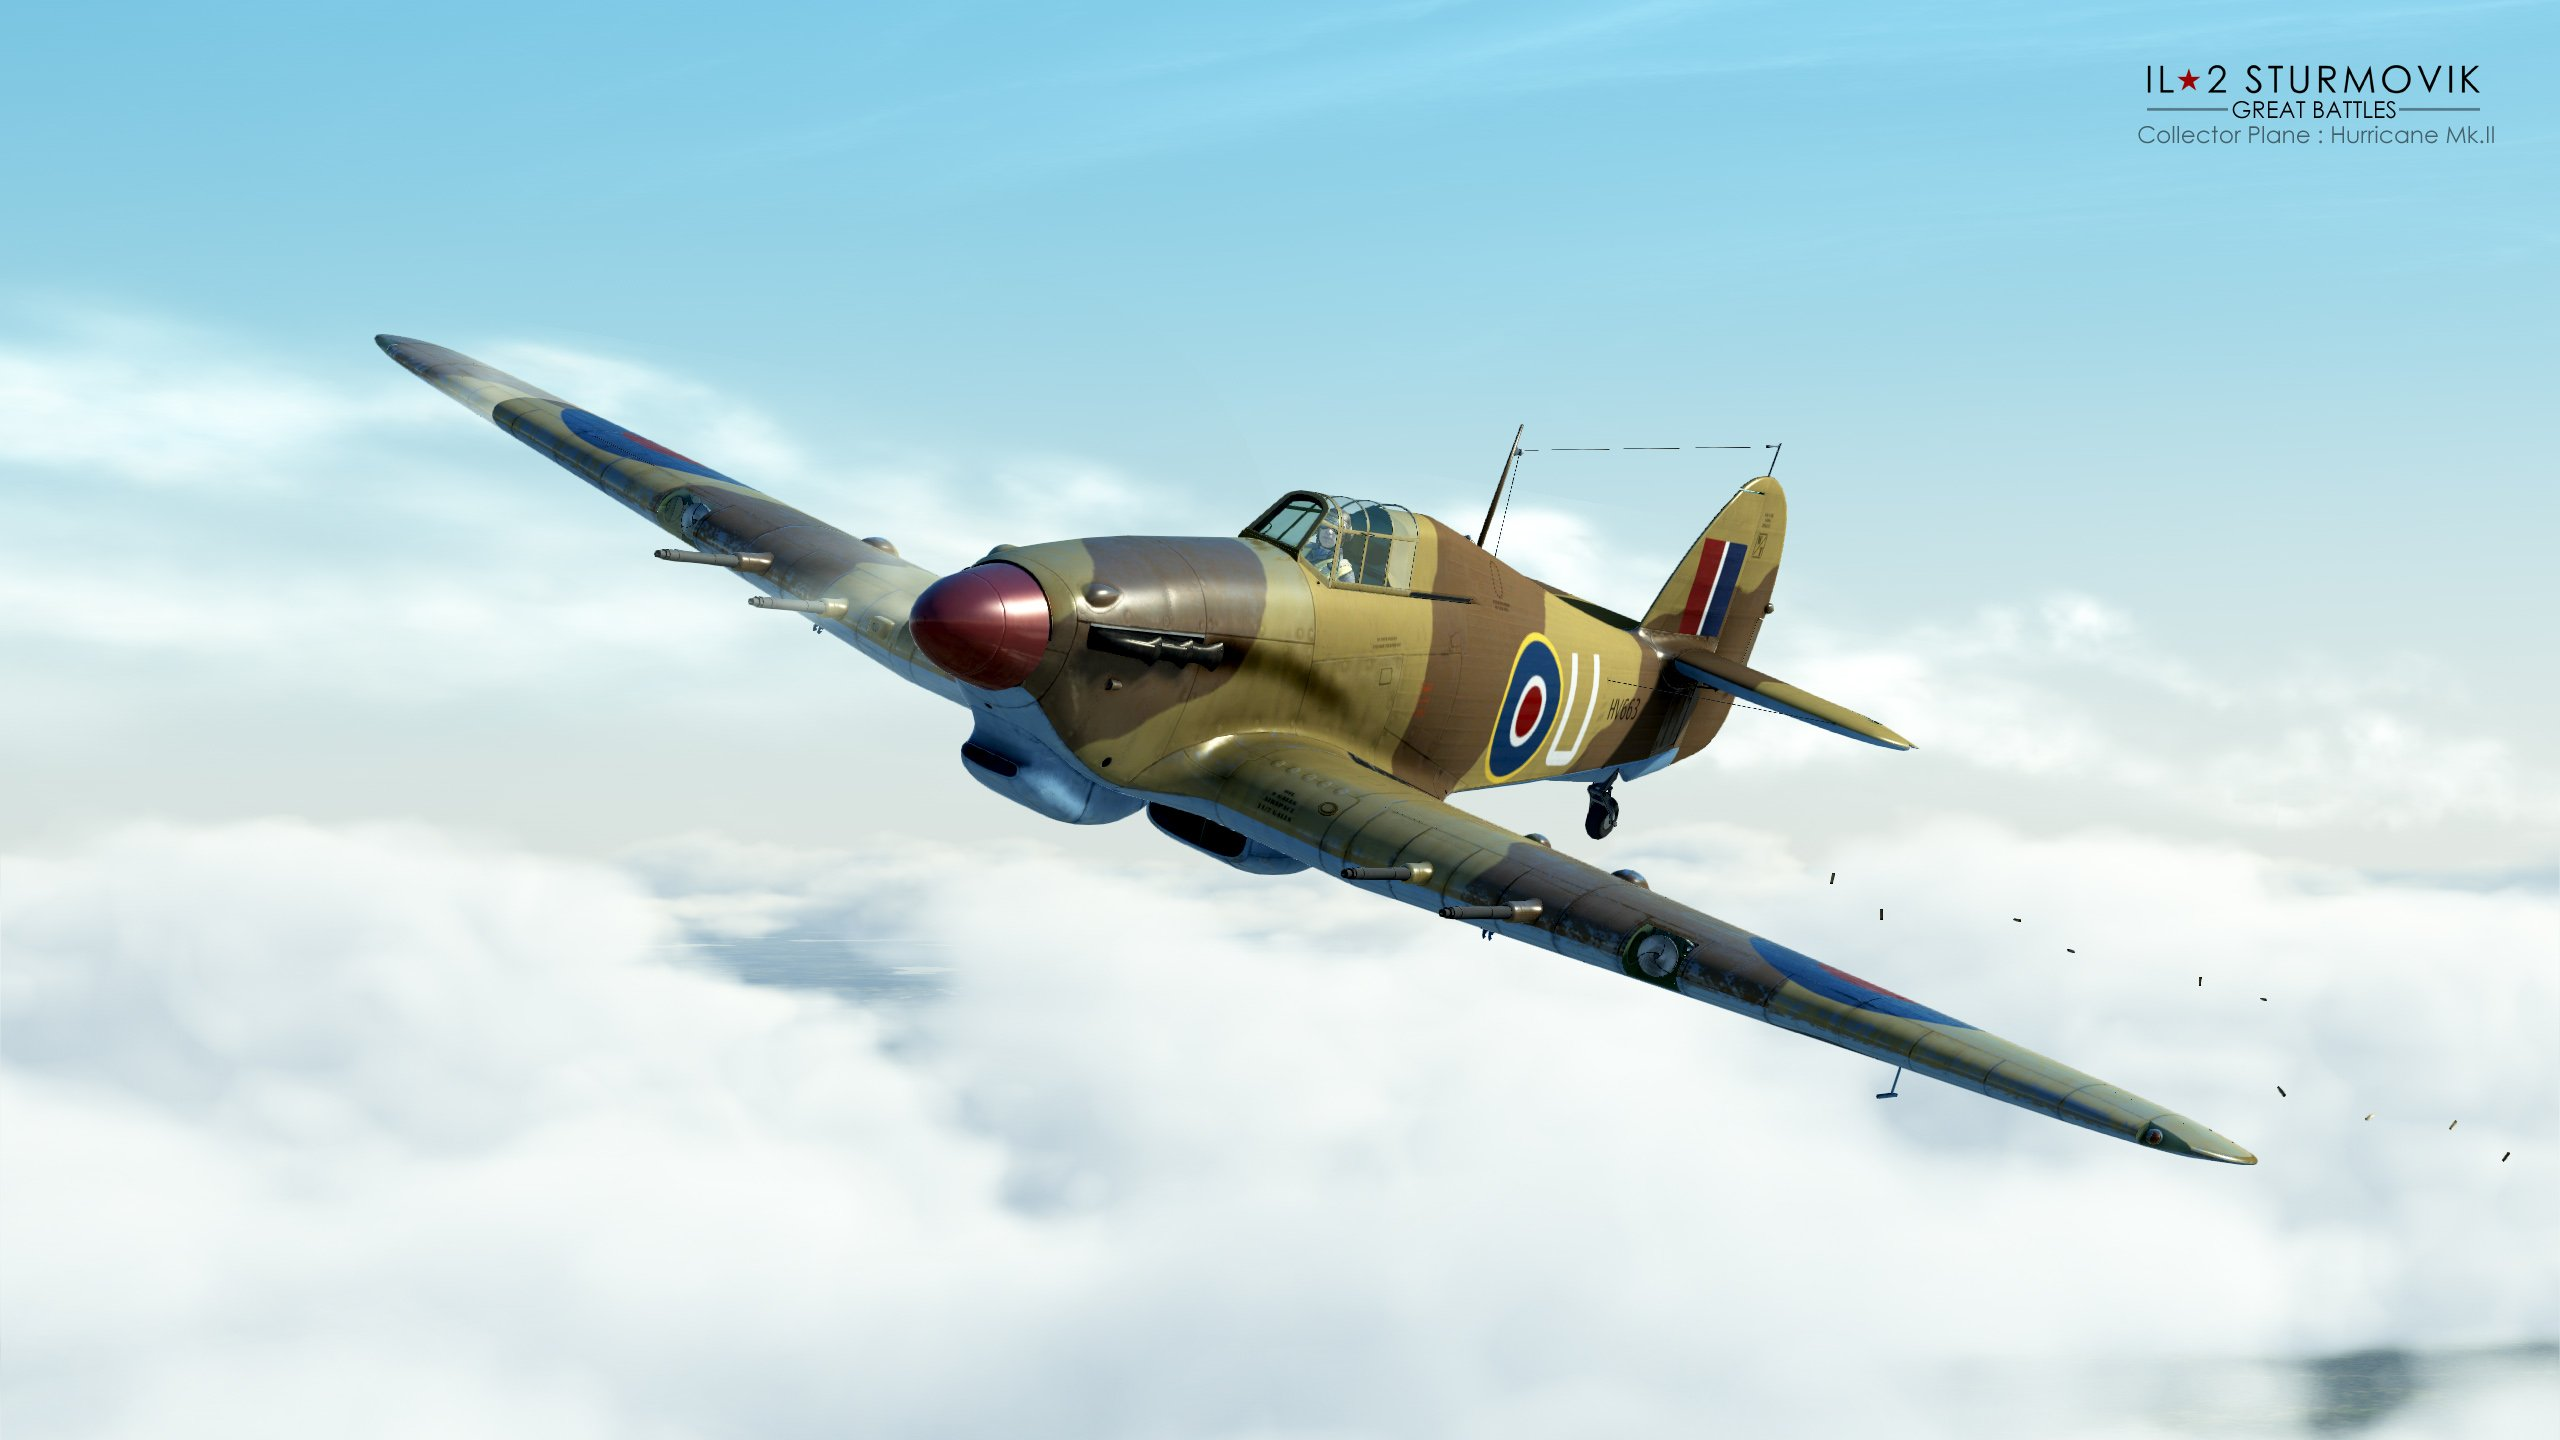 Il-2 Great Battles: JDD N°261 Avec du Hurricaine Mk II